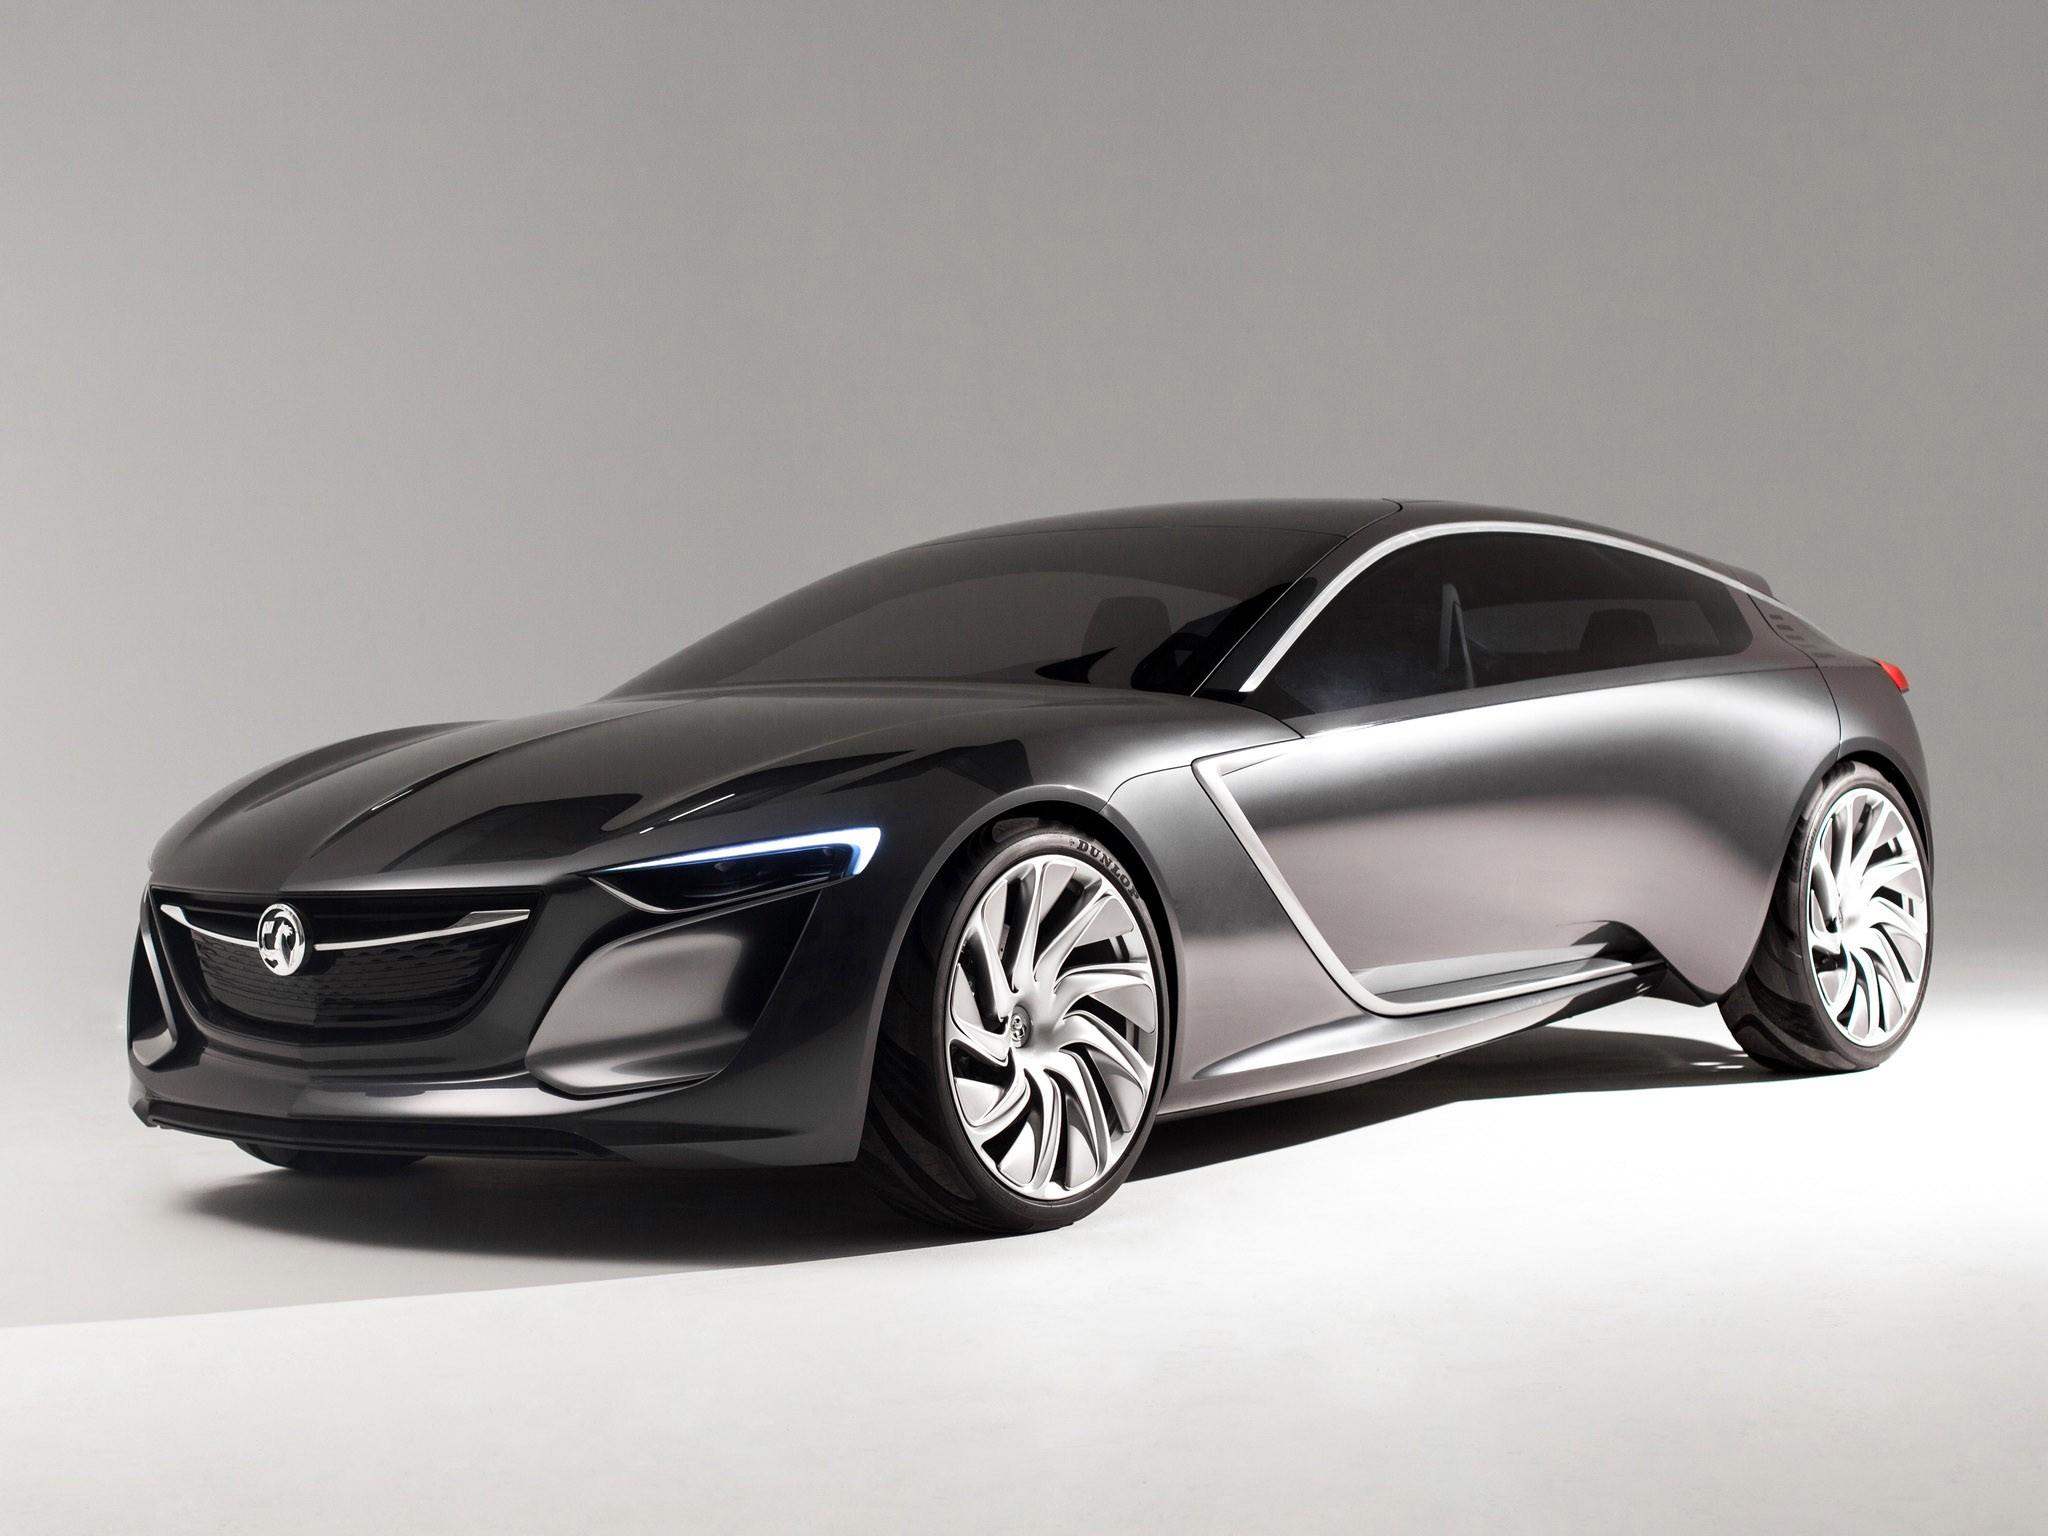 2013 Vauxhall Monza Concept